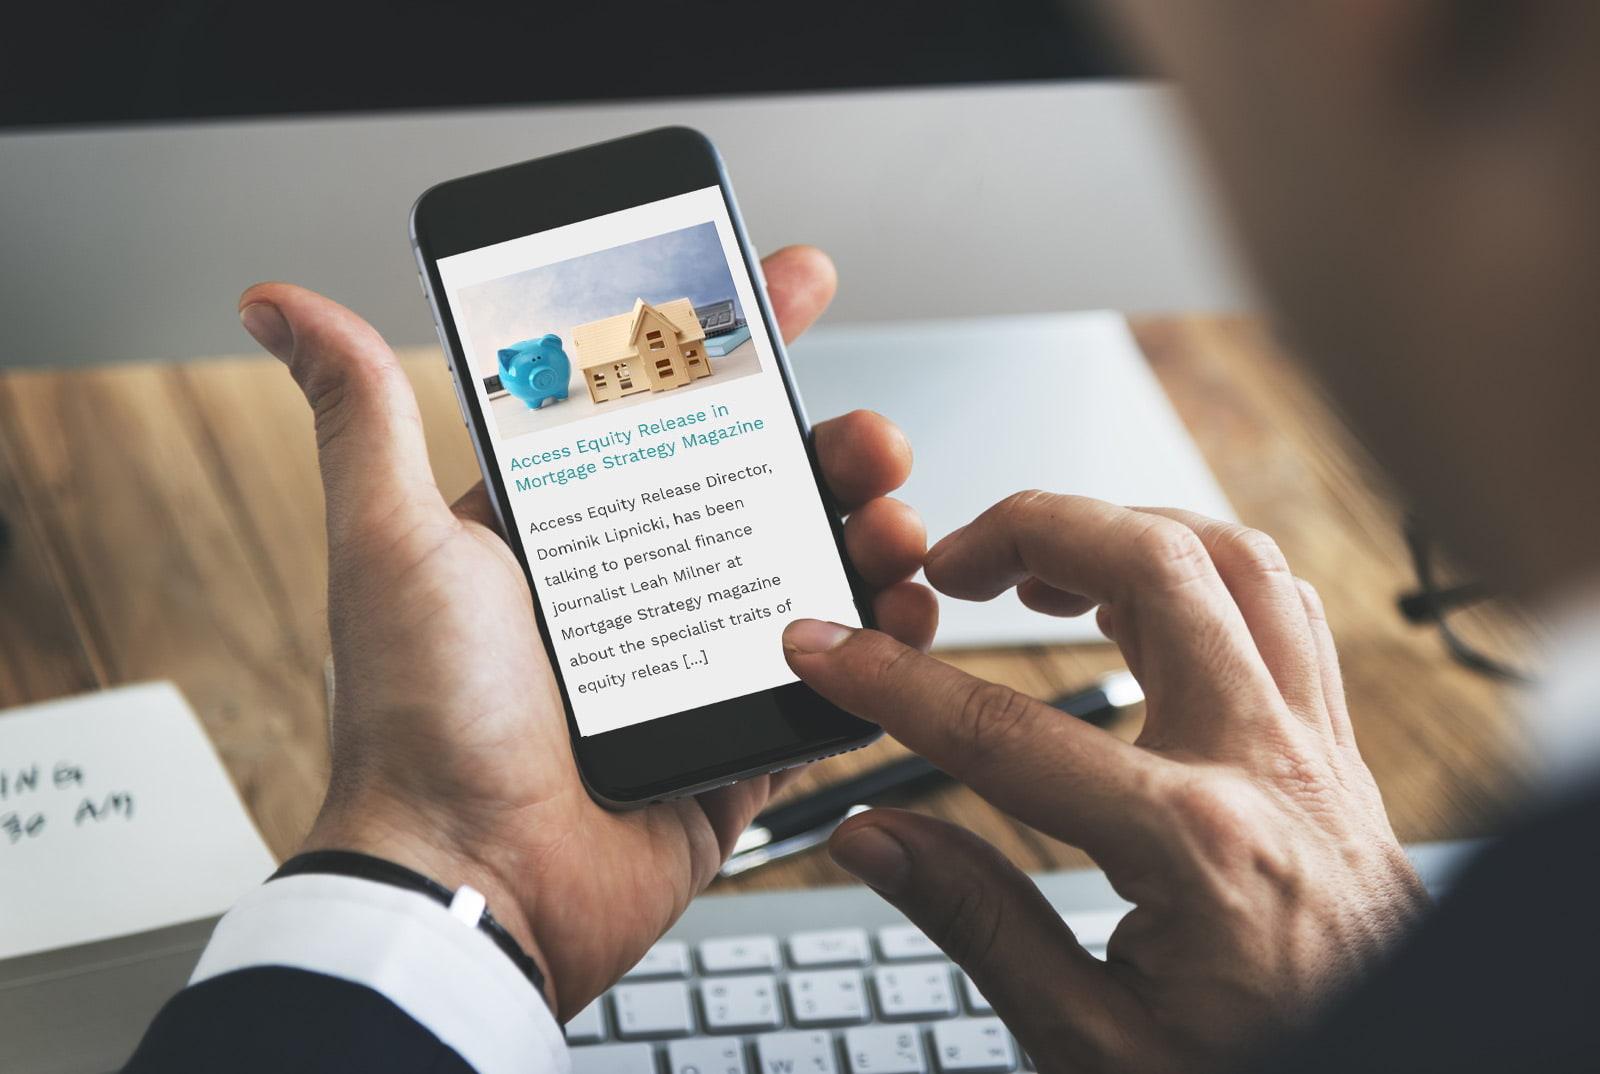 Financial advisors website by JJ Solutions built using WordPress